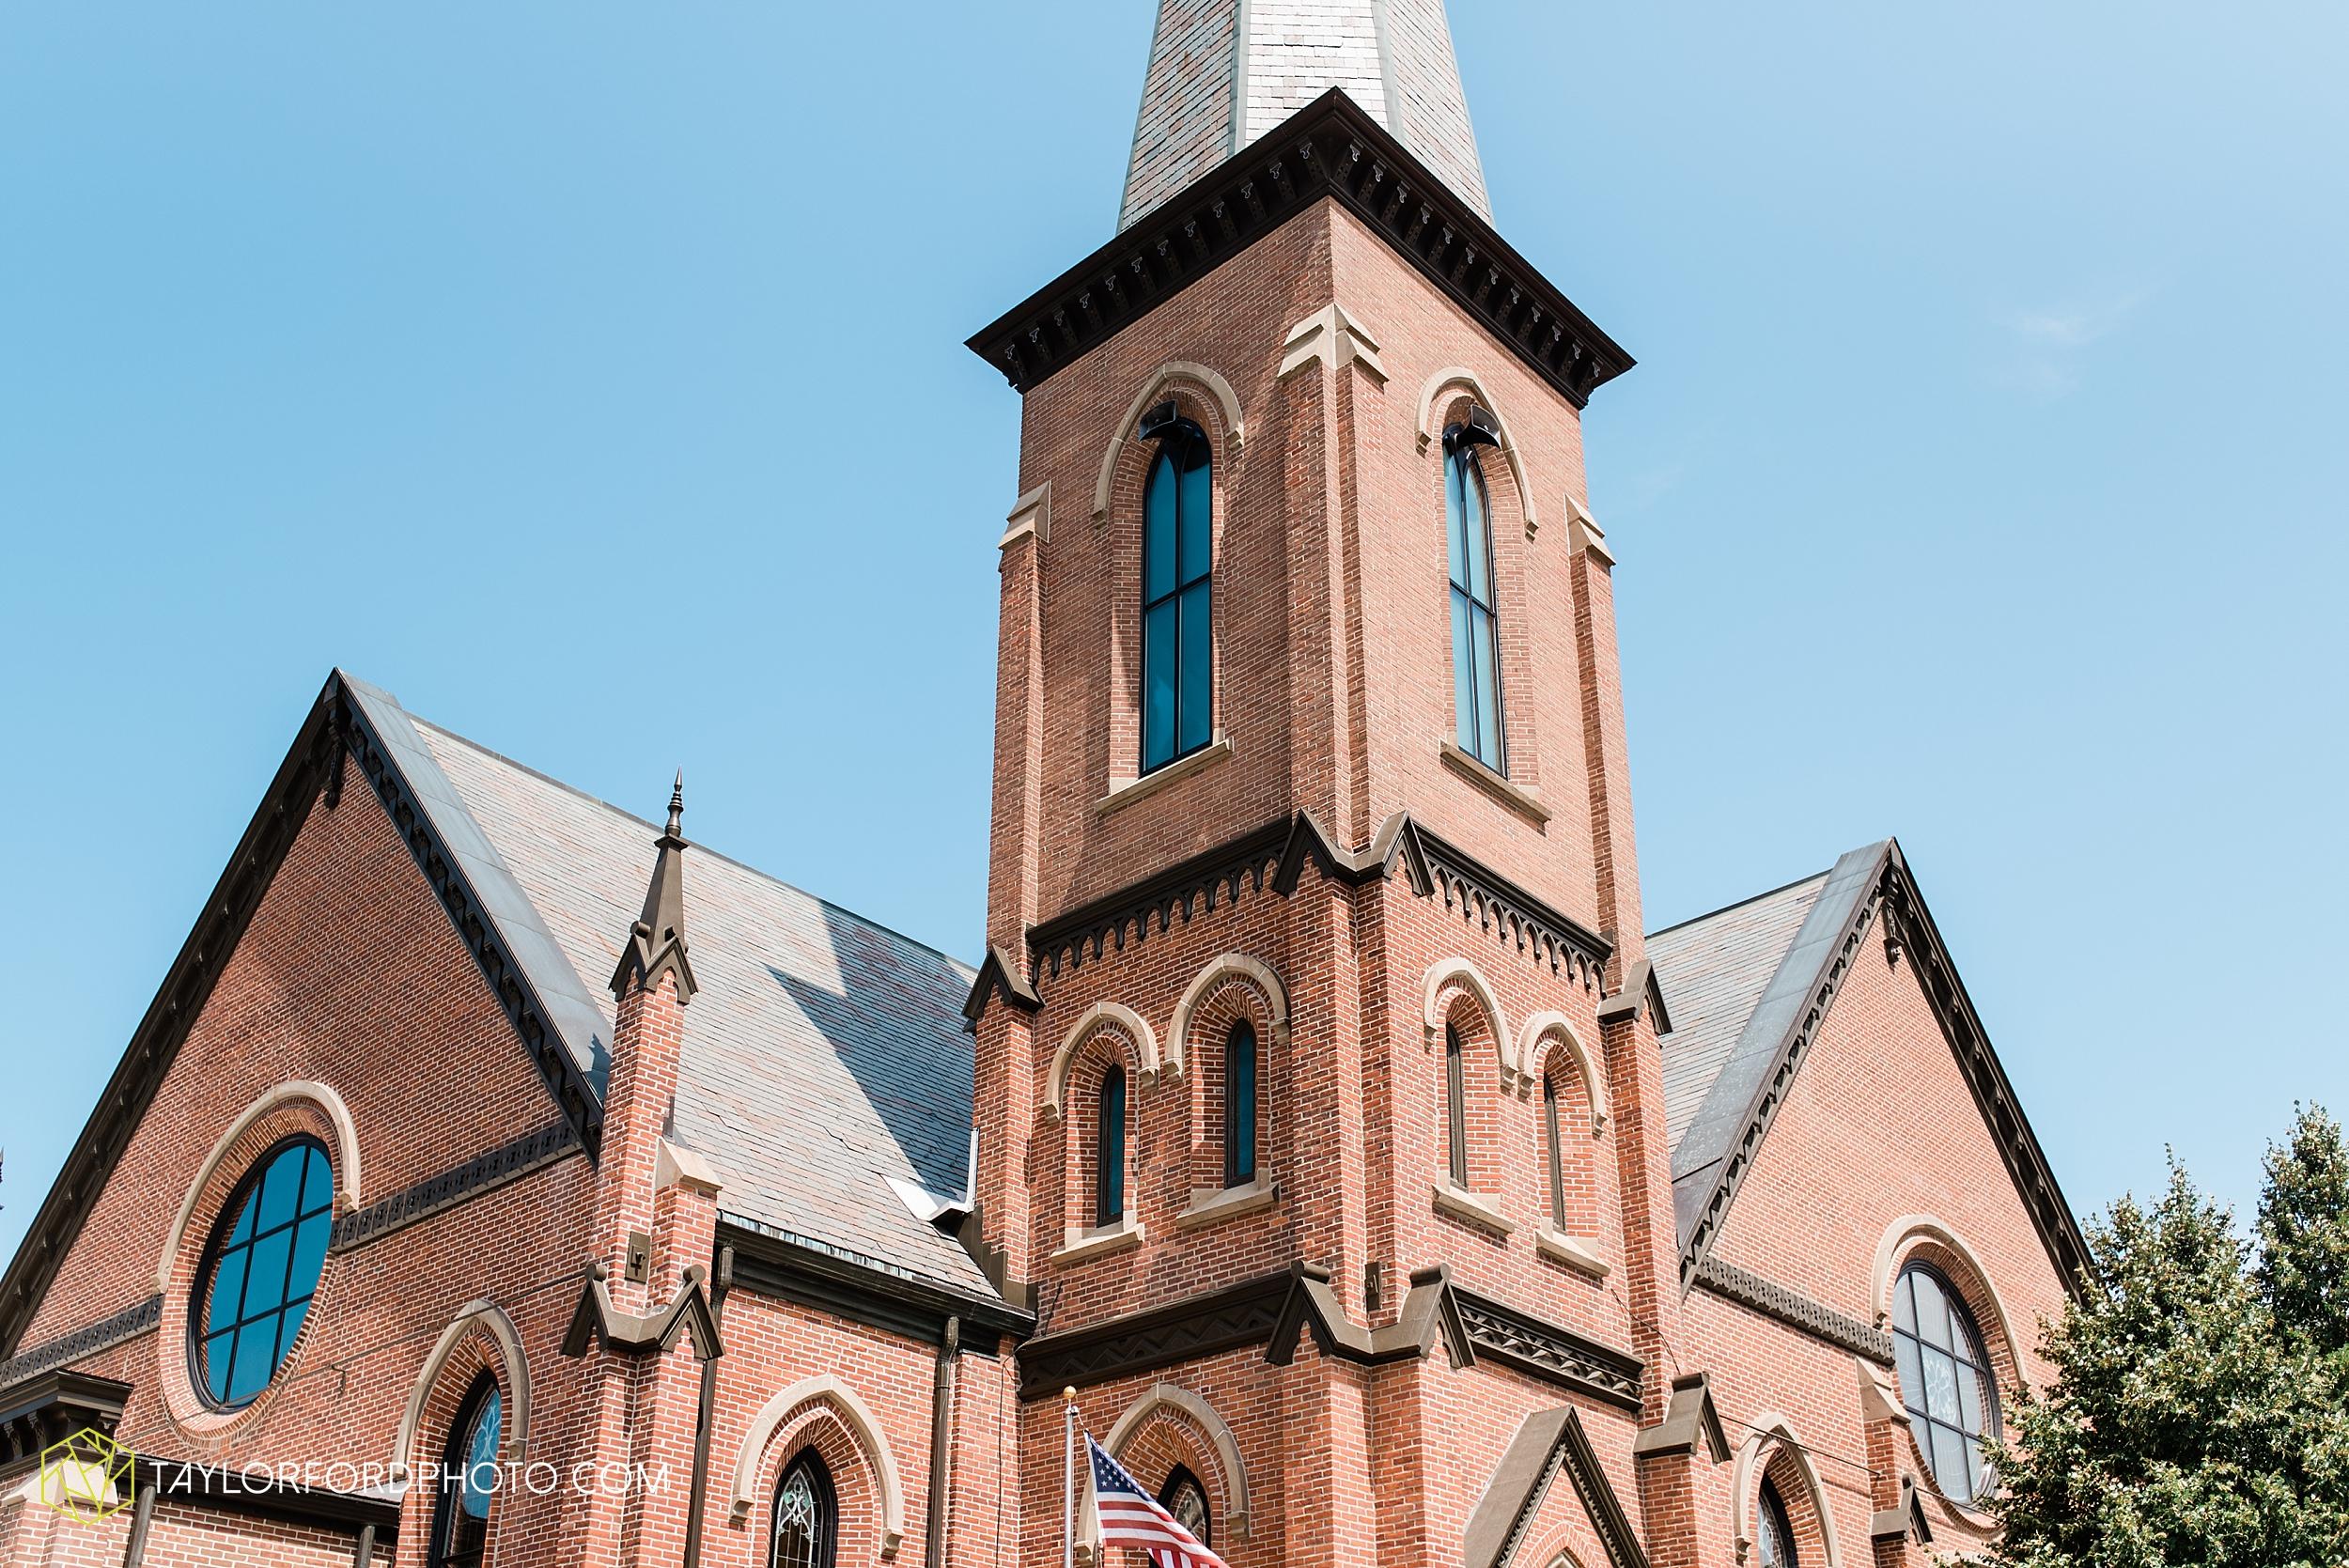 van-wert-ohio-first-united-methodist-church-county-dairy-barn-wedding-photographer-taylor-ford-photography_9819.jpg